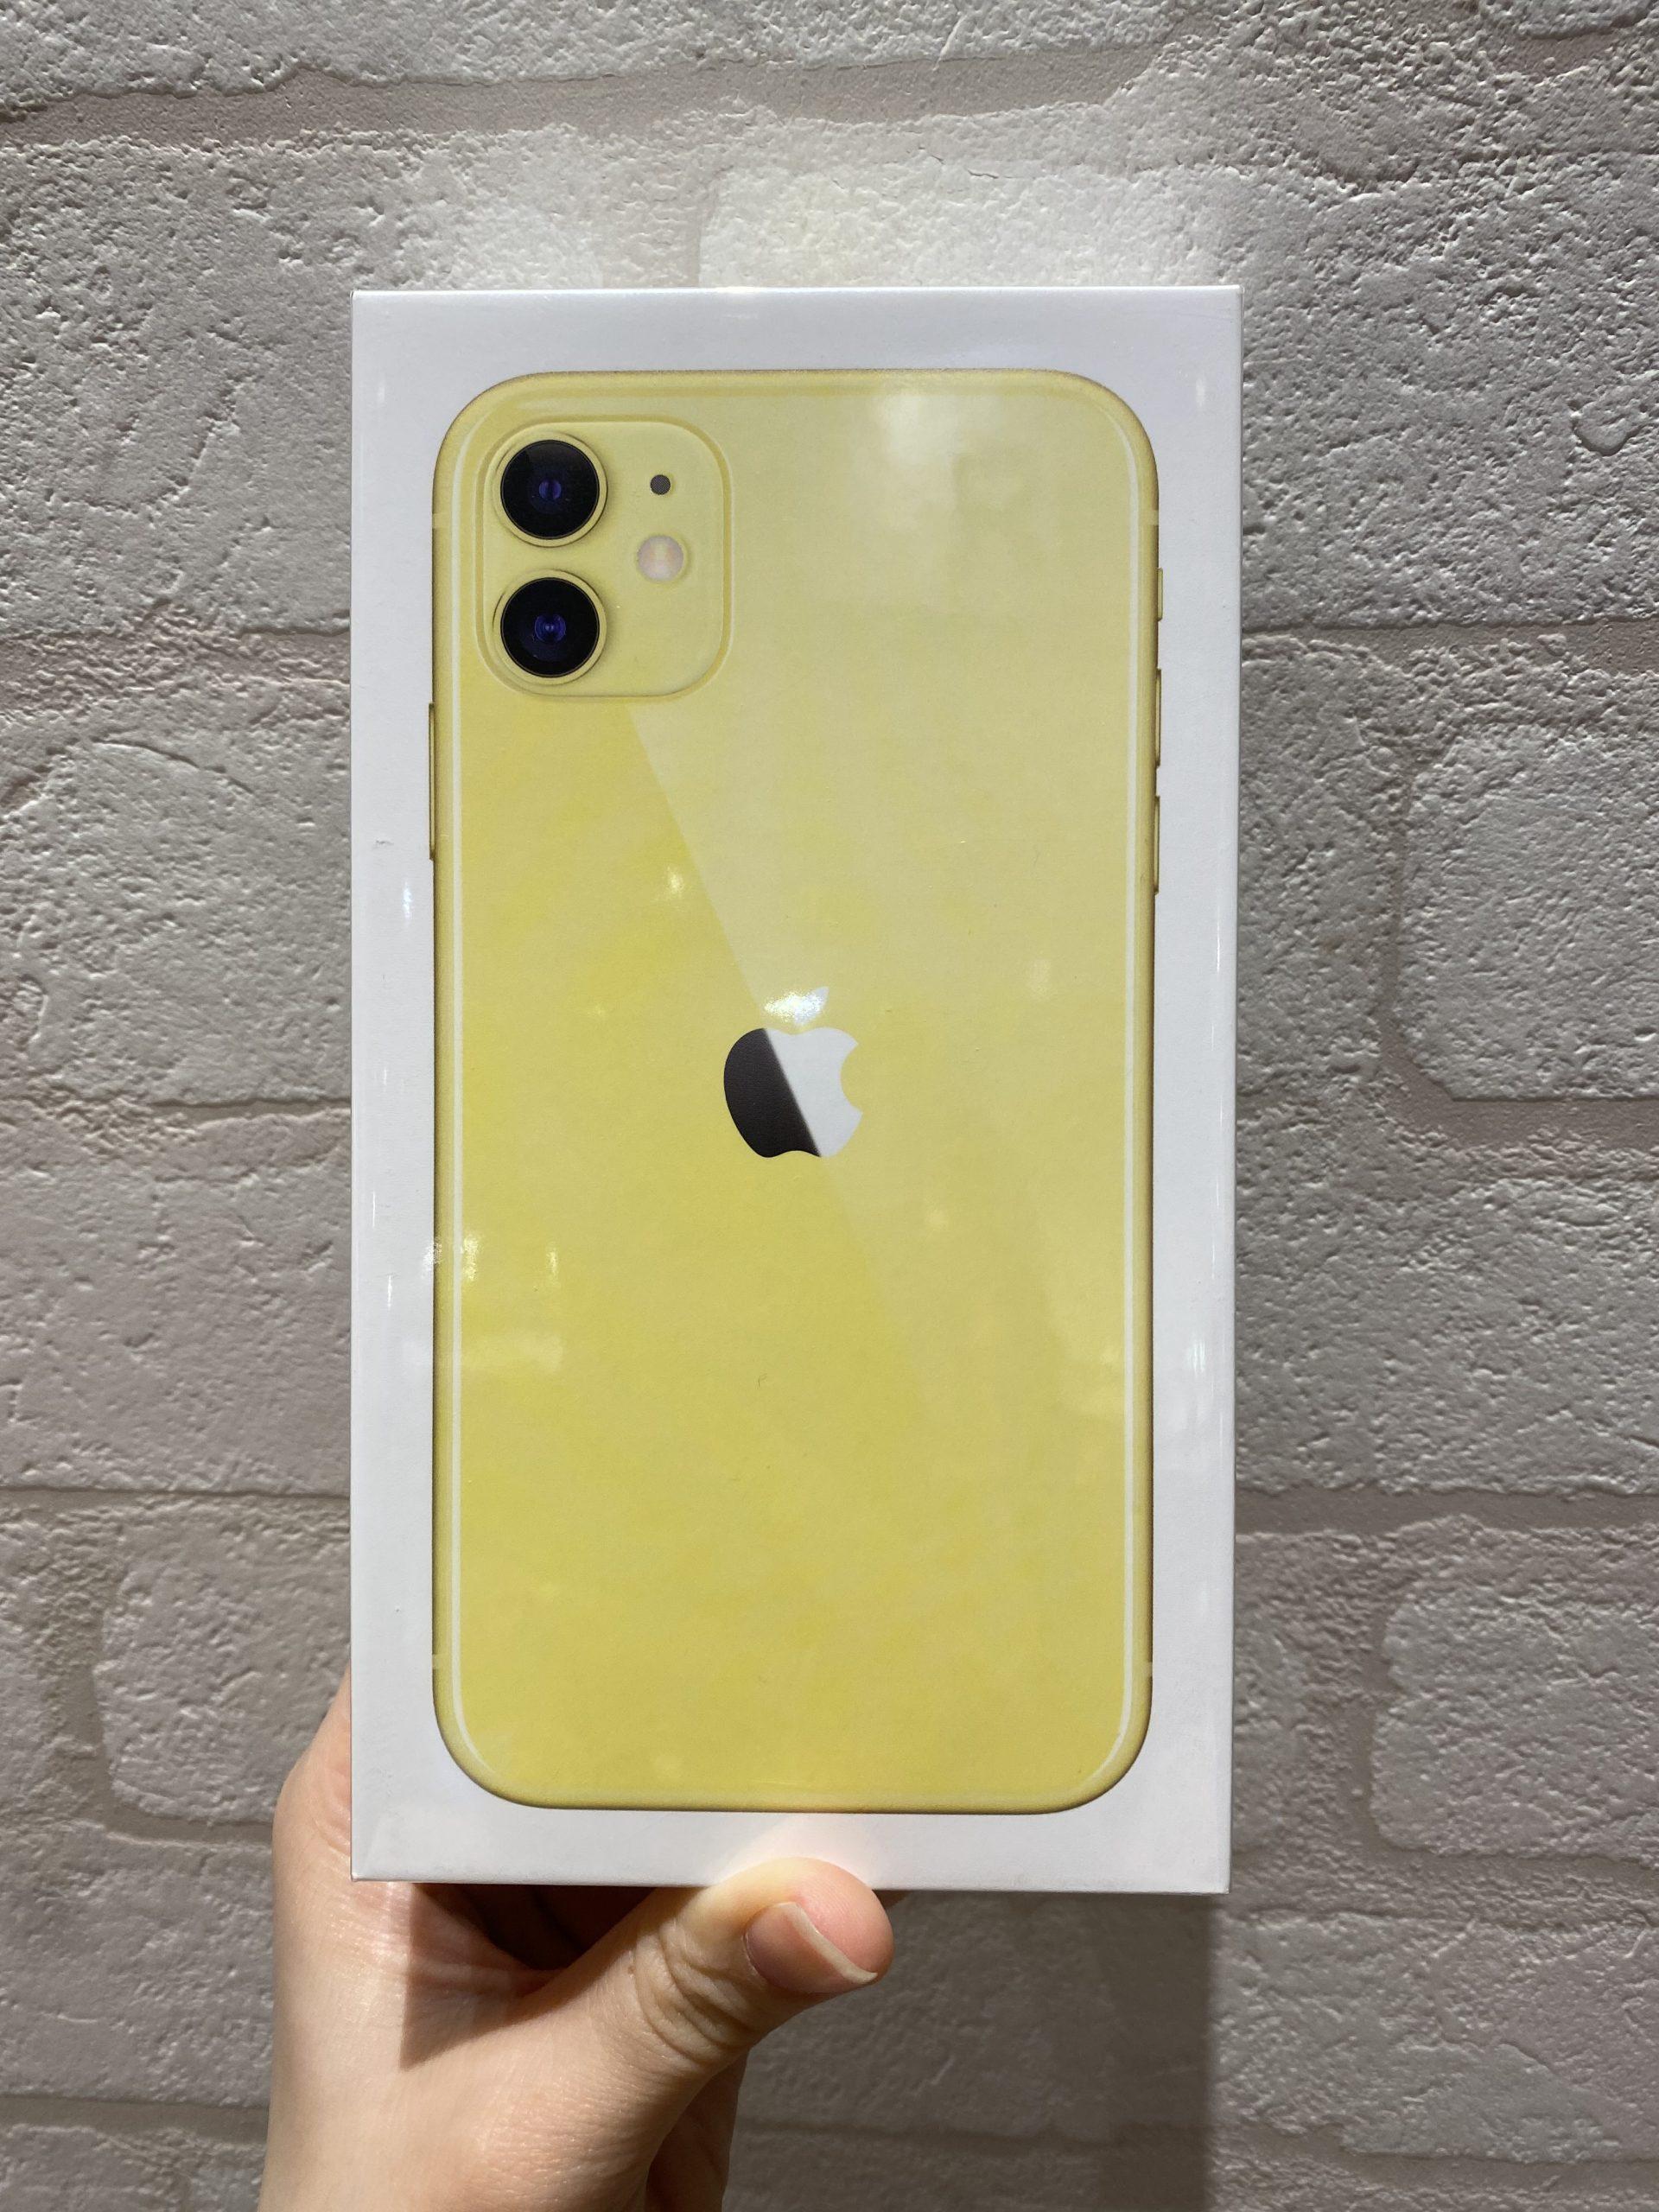 iPhone11 simフリー 新品未開封 イエロー 128GB